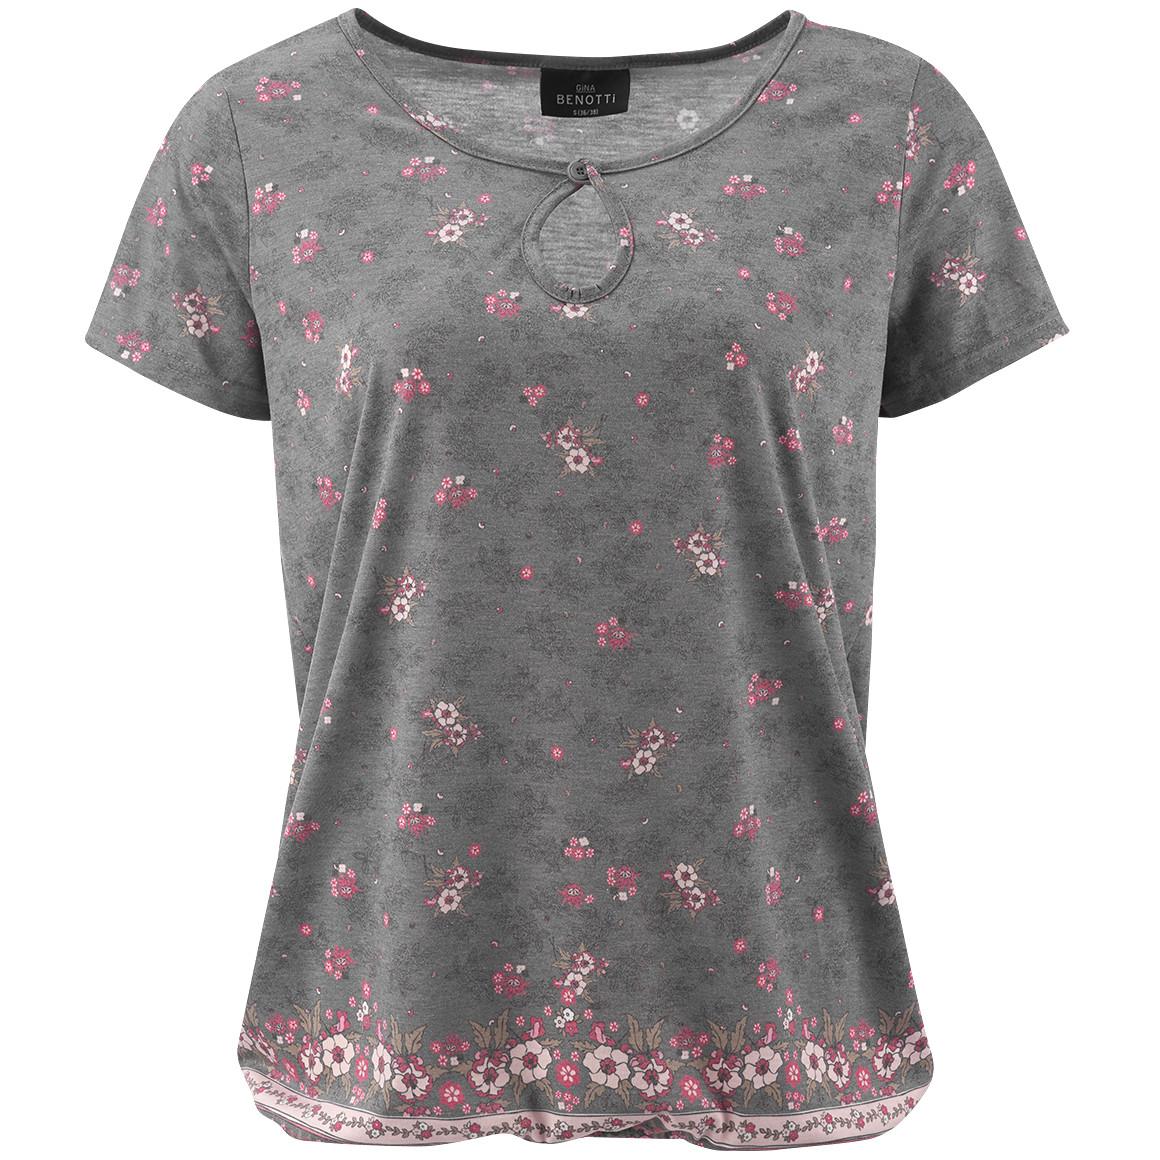 Damen T-Shirt mit Blumenprint jetztbilligerkaufen